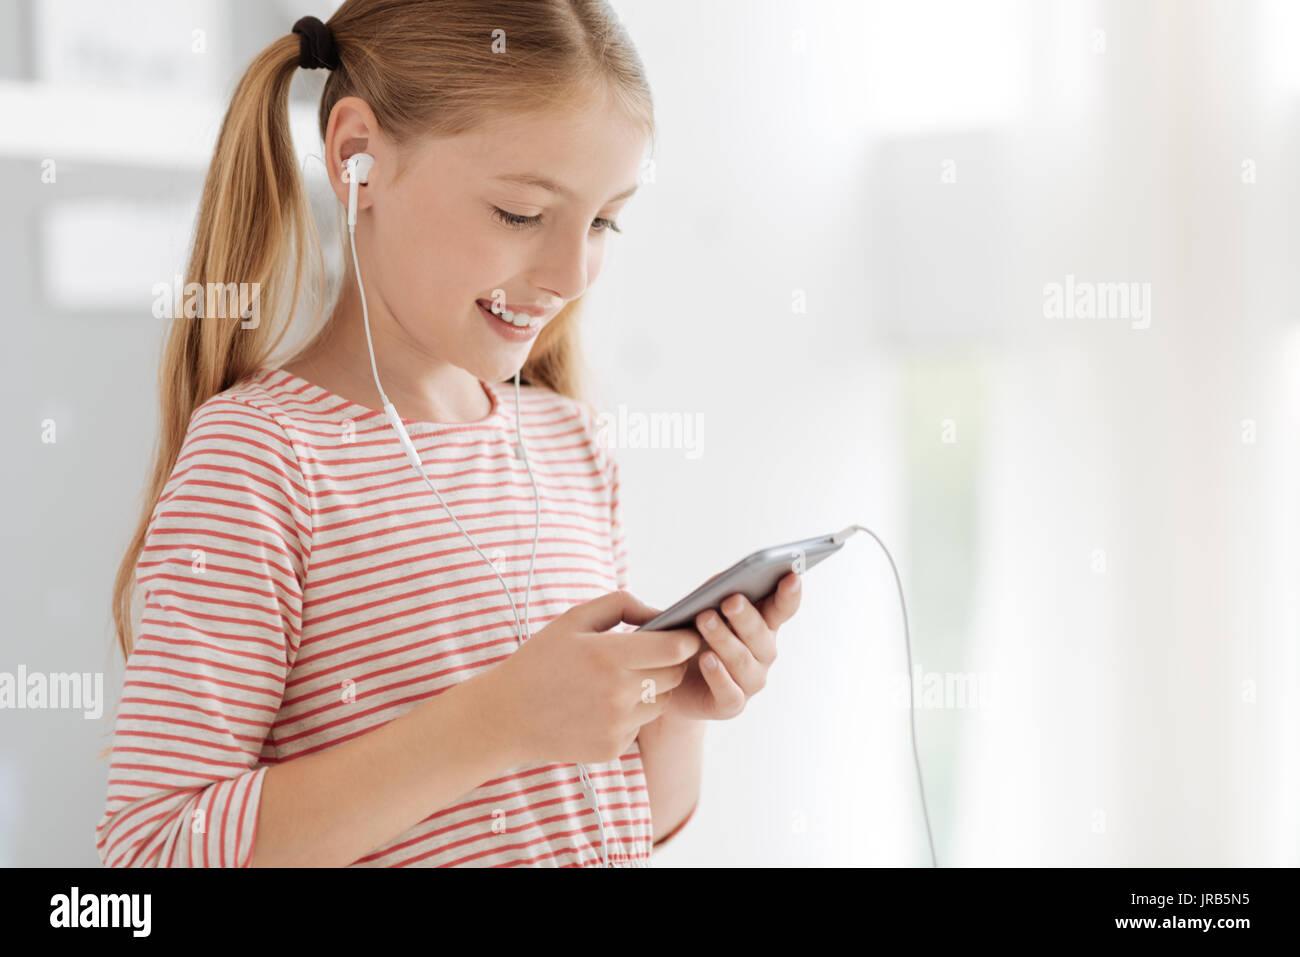 Positiv gesinnten Kind Musik hören Stockbild